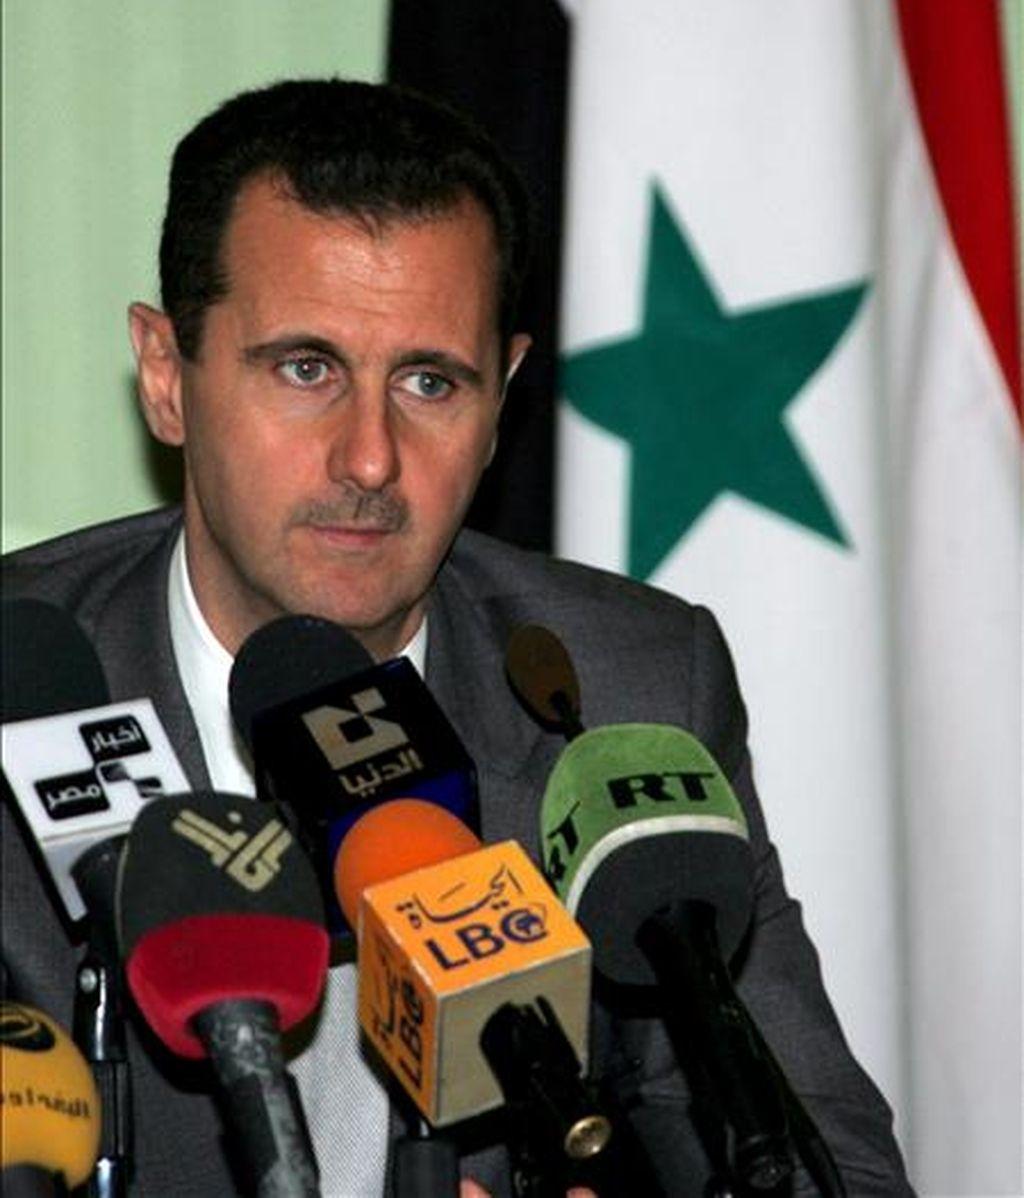 El presidente sirio, Bashar Assad. EFE/Archivo